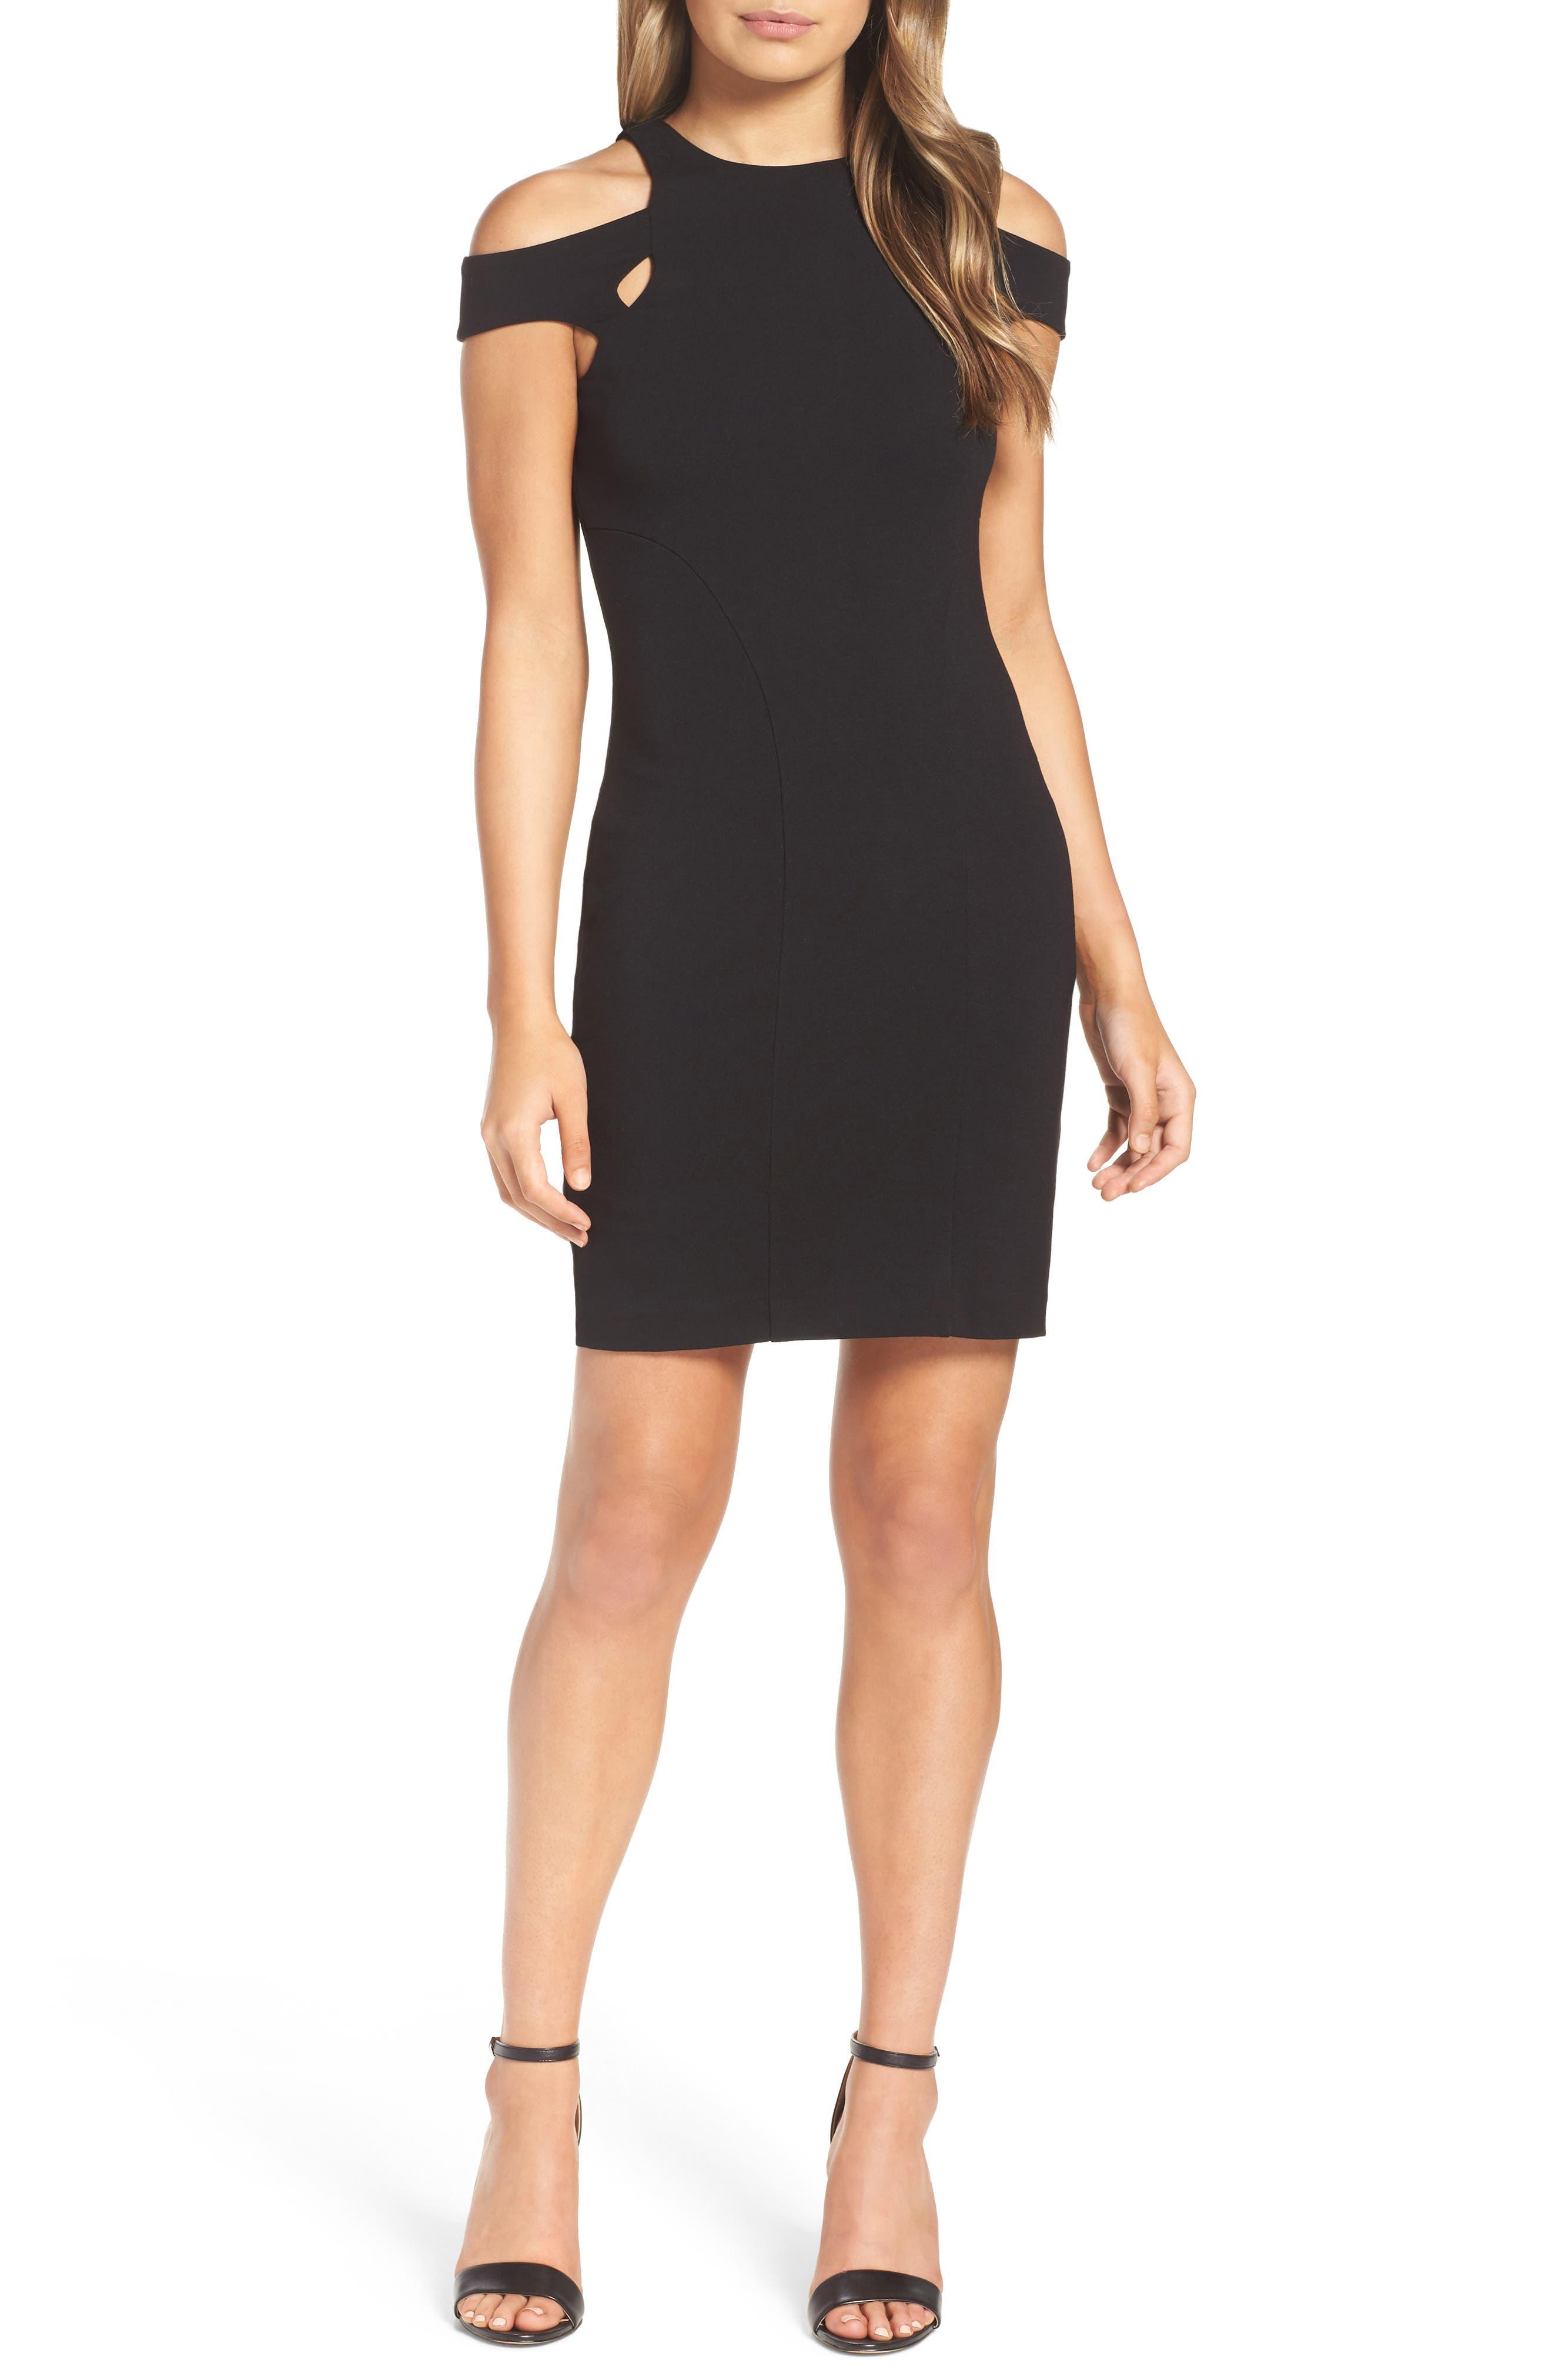 Muy Caliente Cold Shoulder Body-Con Dress,                             Main thumbnail 1, color,                             001